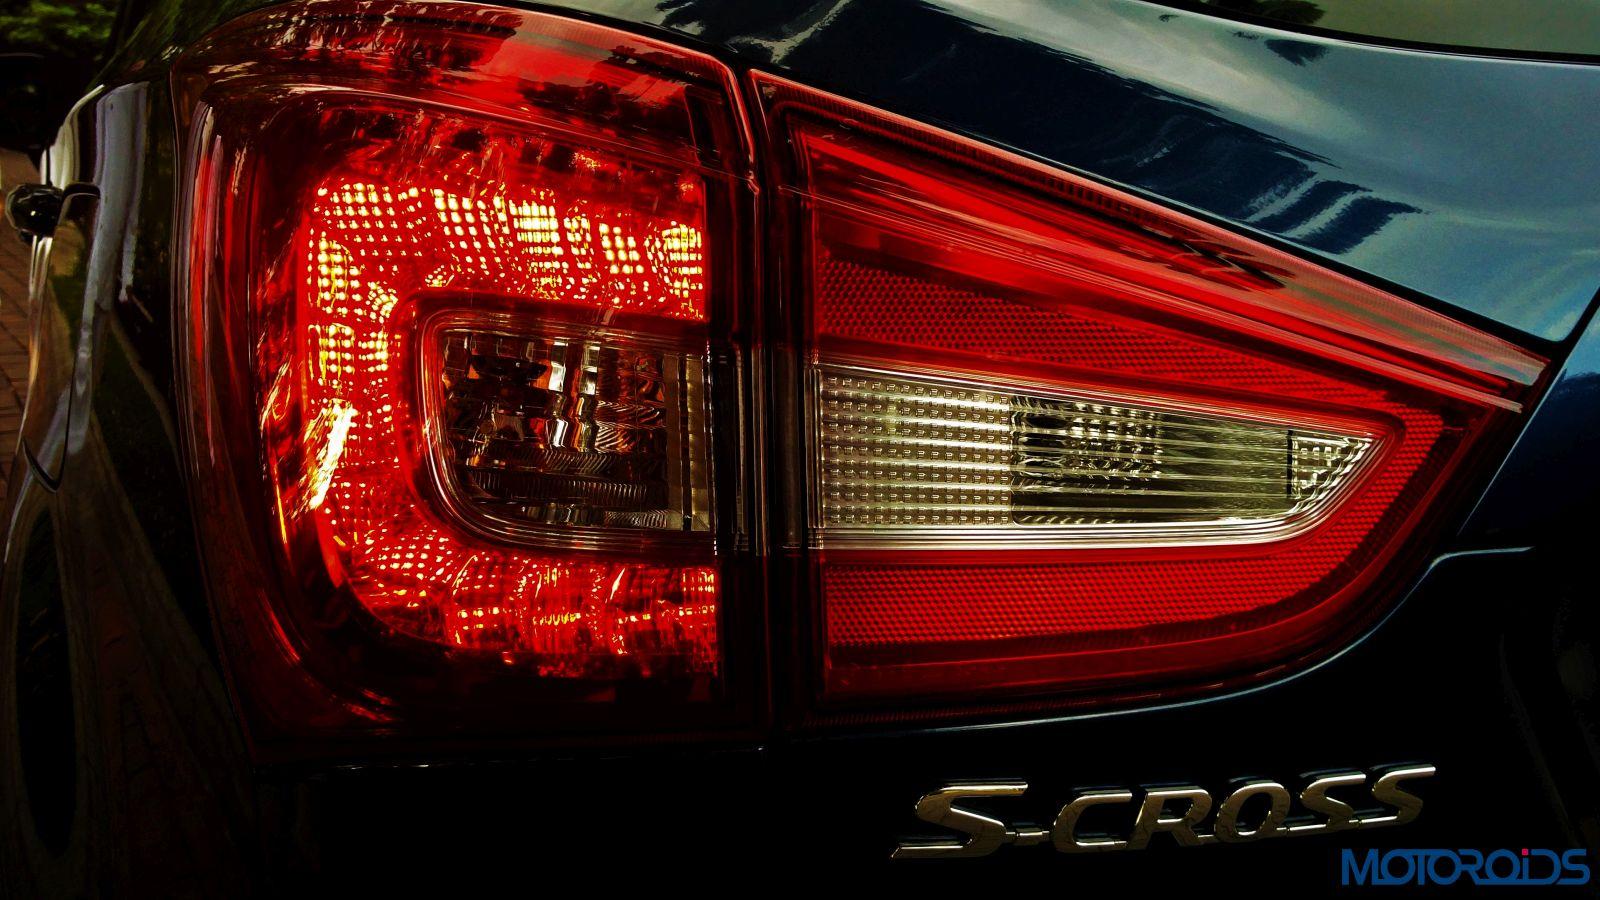 New-Maruti-Suzuki-S-Cross-Alpha-Review-static-images27